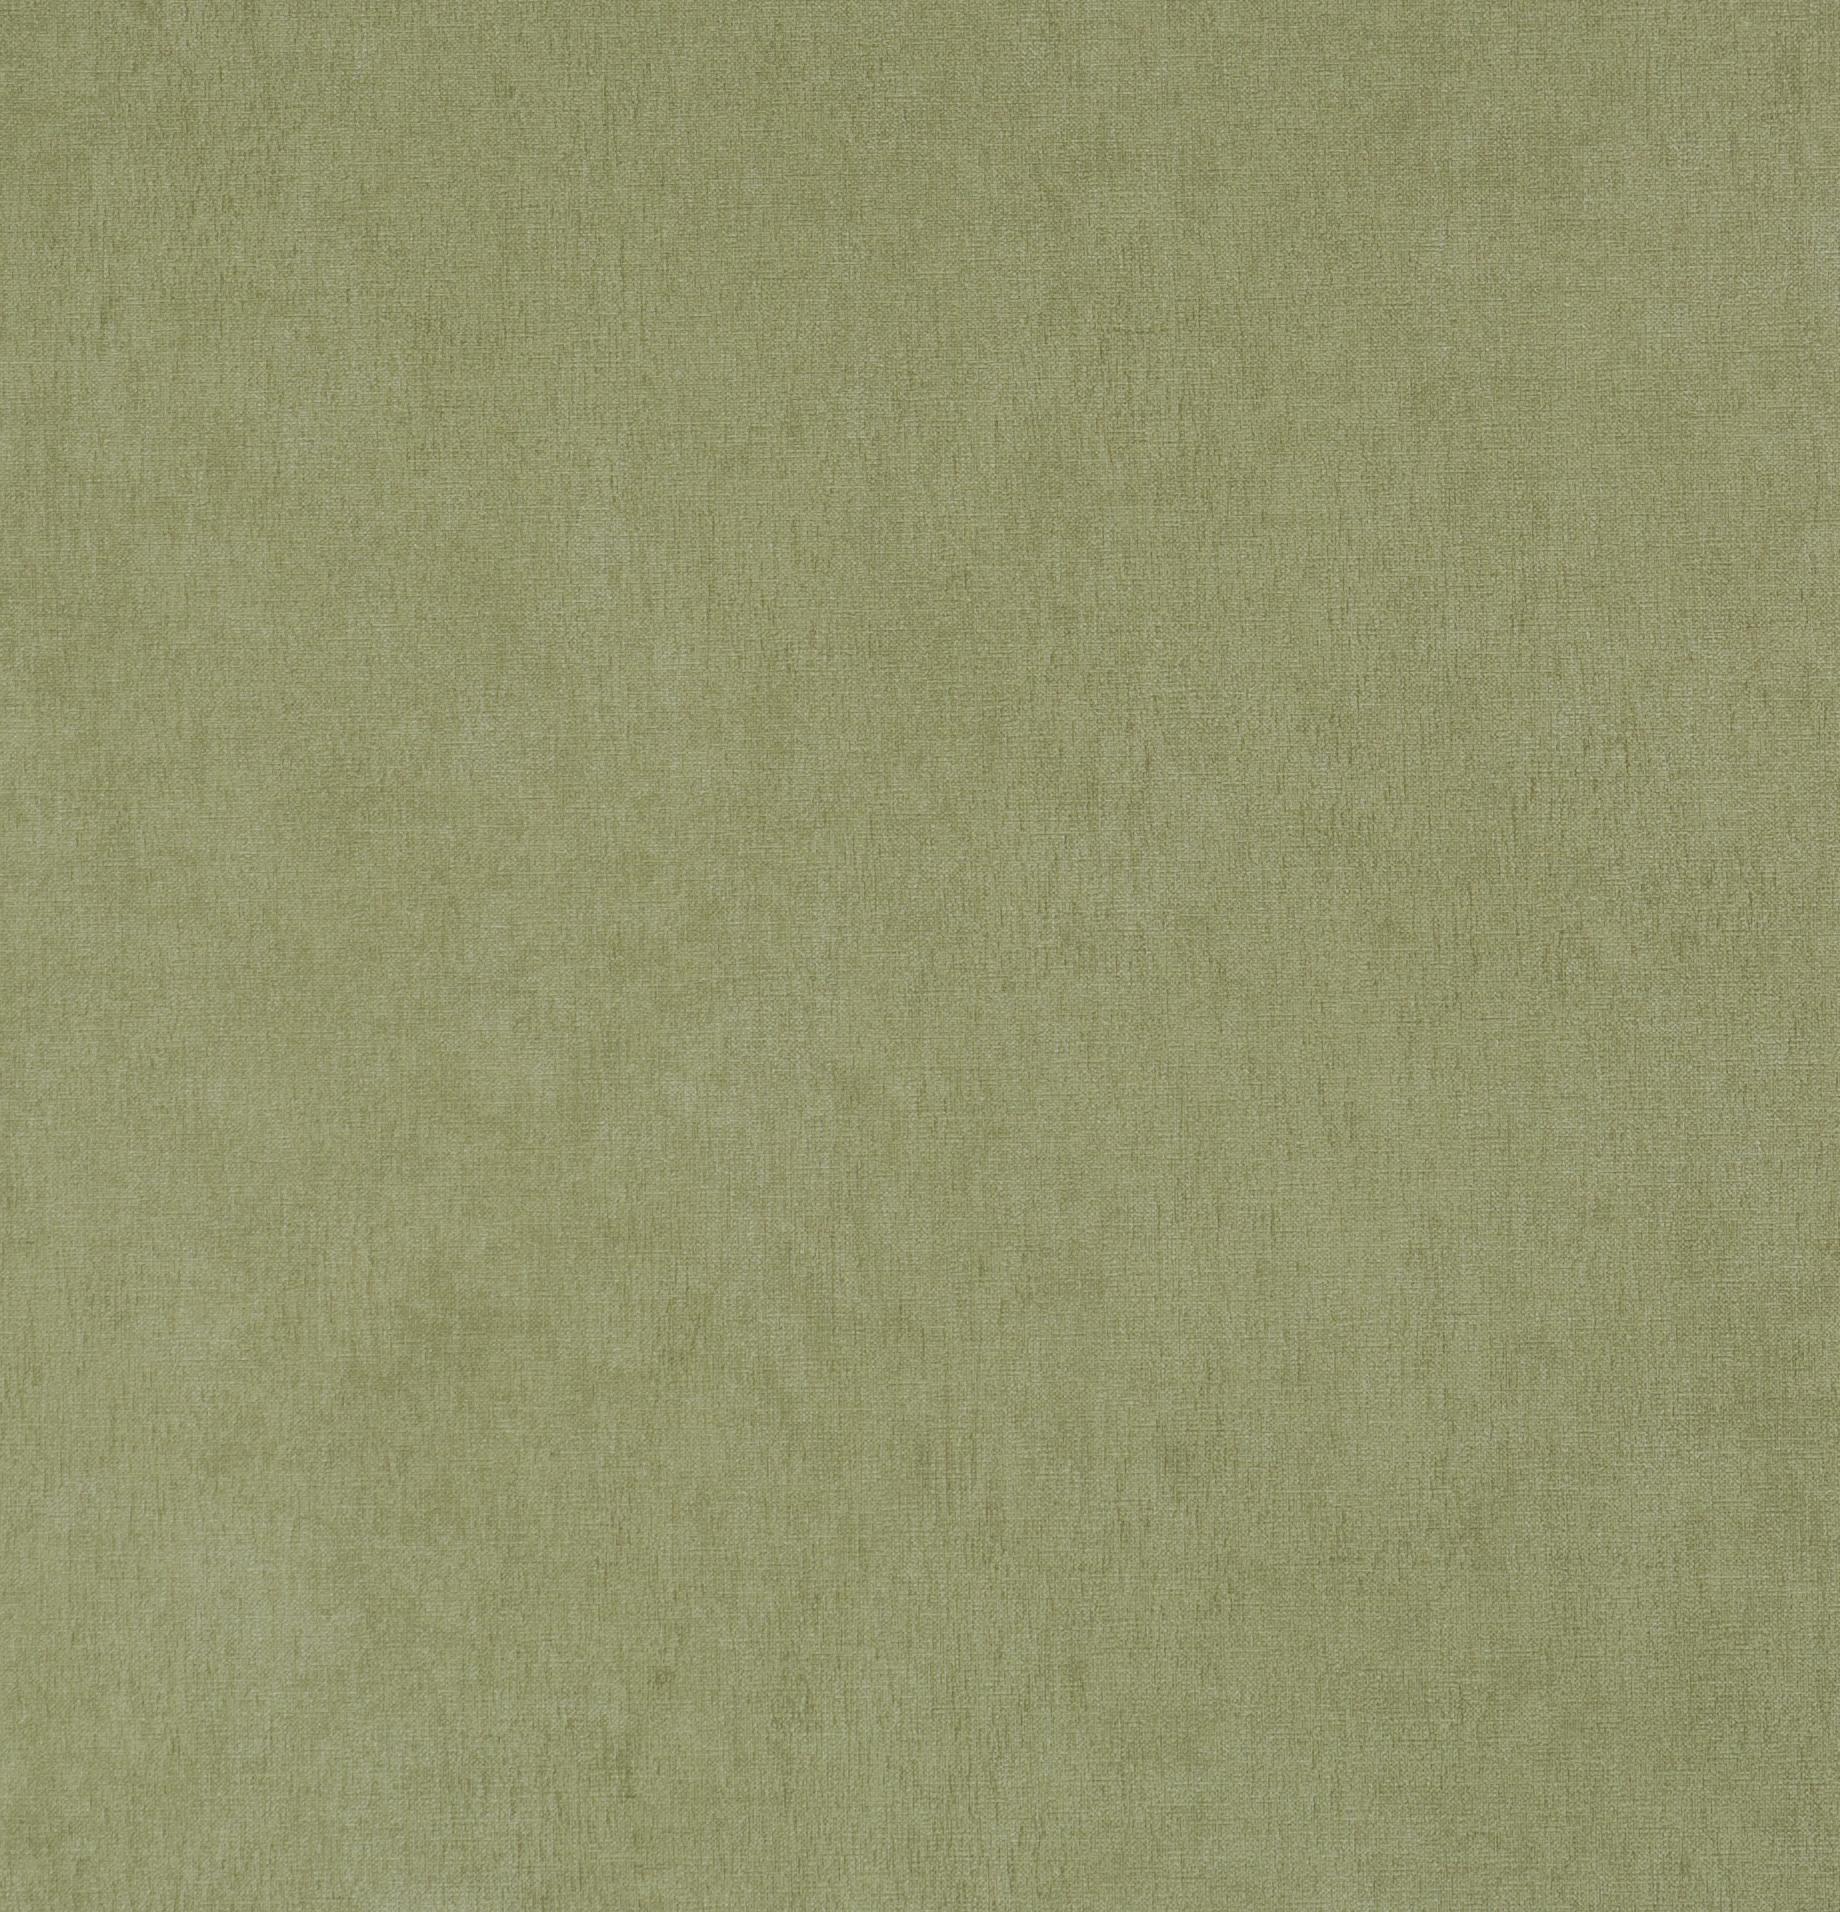 Обои  BN International,  коллекция Colour Line, артикул48474